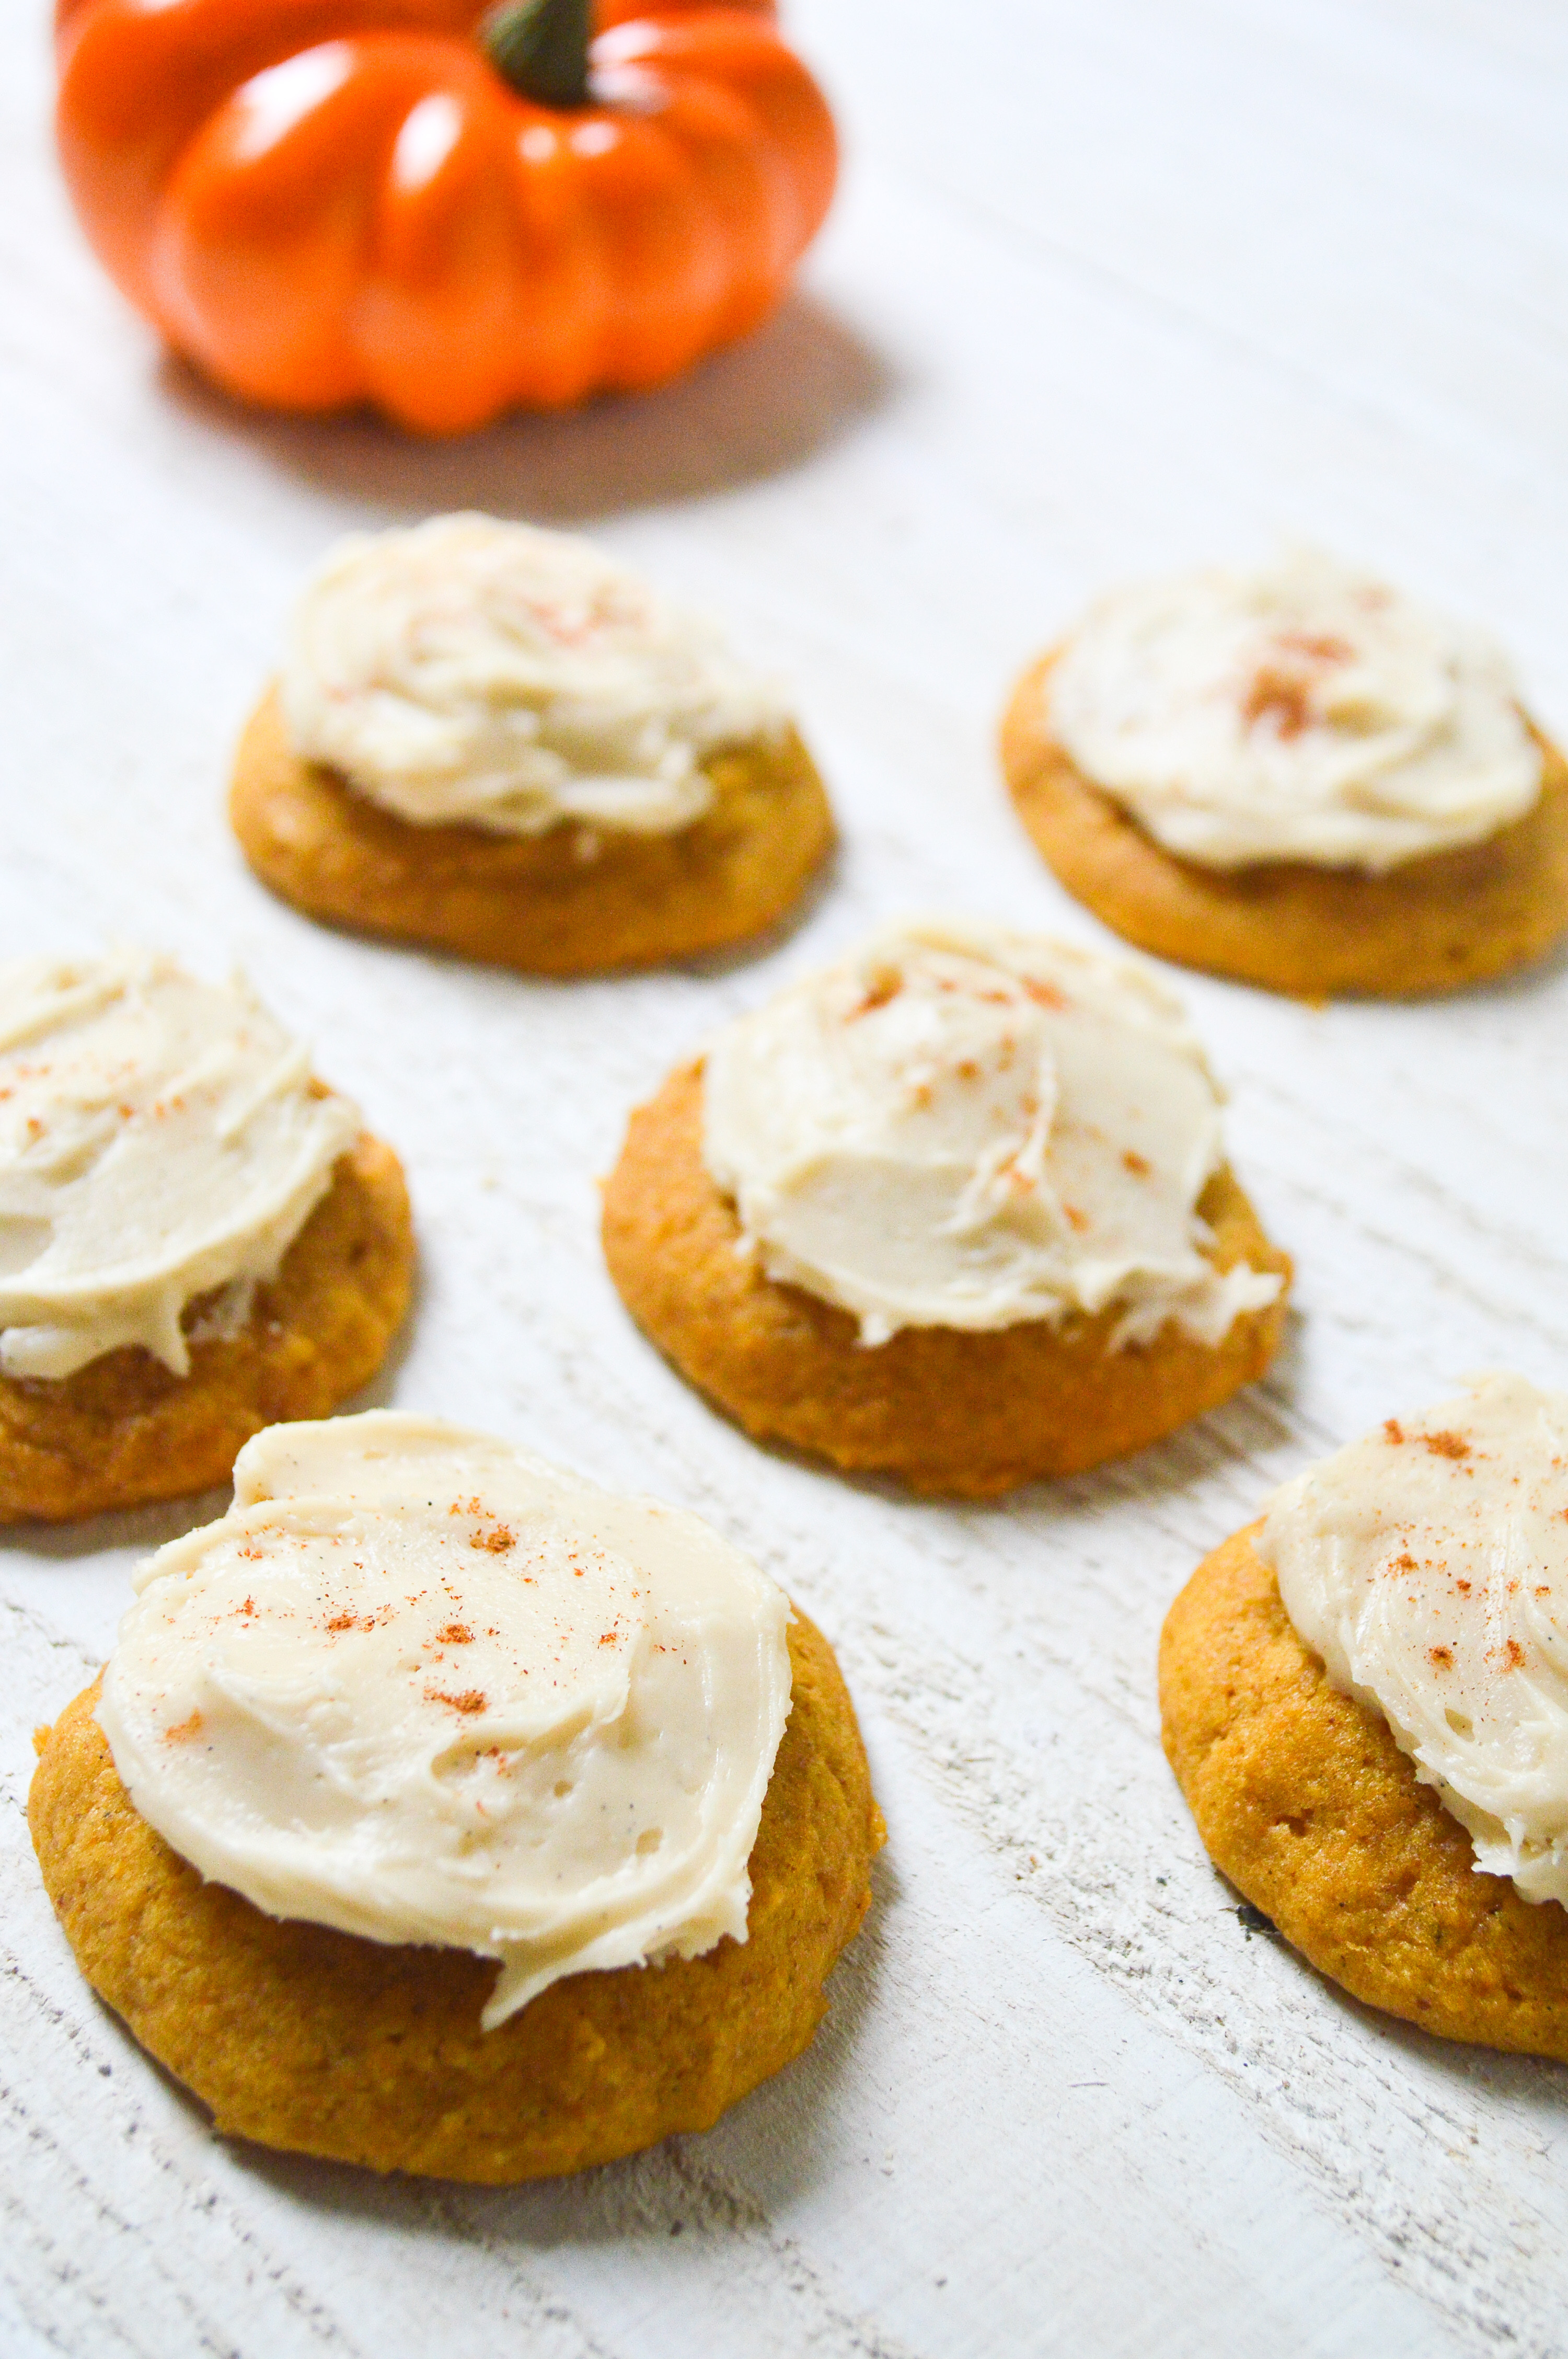 Pumpkin Cookies Recipe  Pumpkin Cookies with Buttercream Frosting The Lemon Press